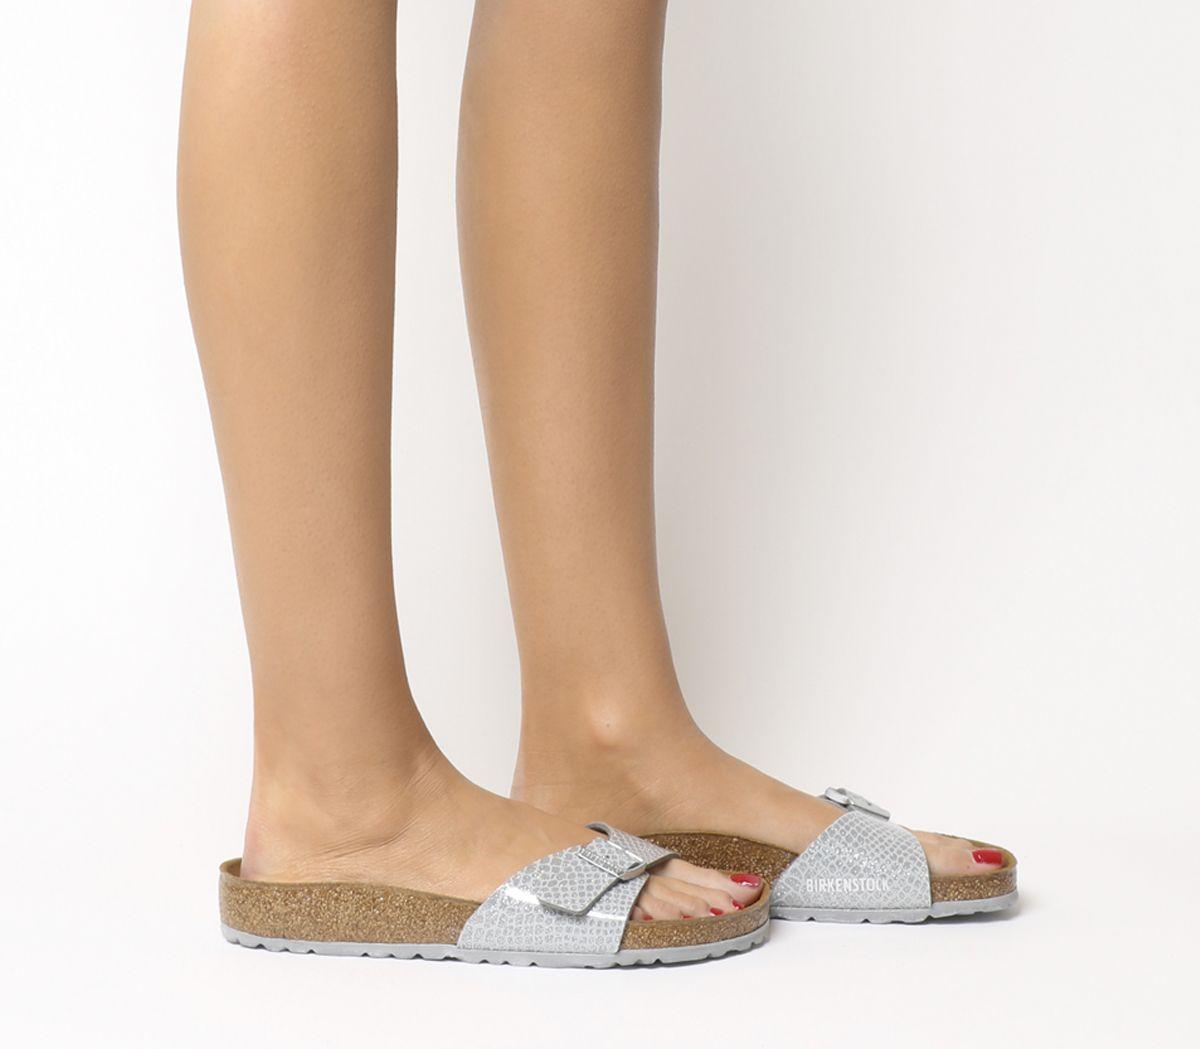 0d2a20d84e304c Birkenstock Madrid 1 Bar Mules Magic Snake Silver - Sandals